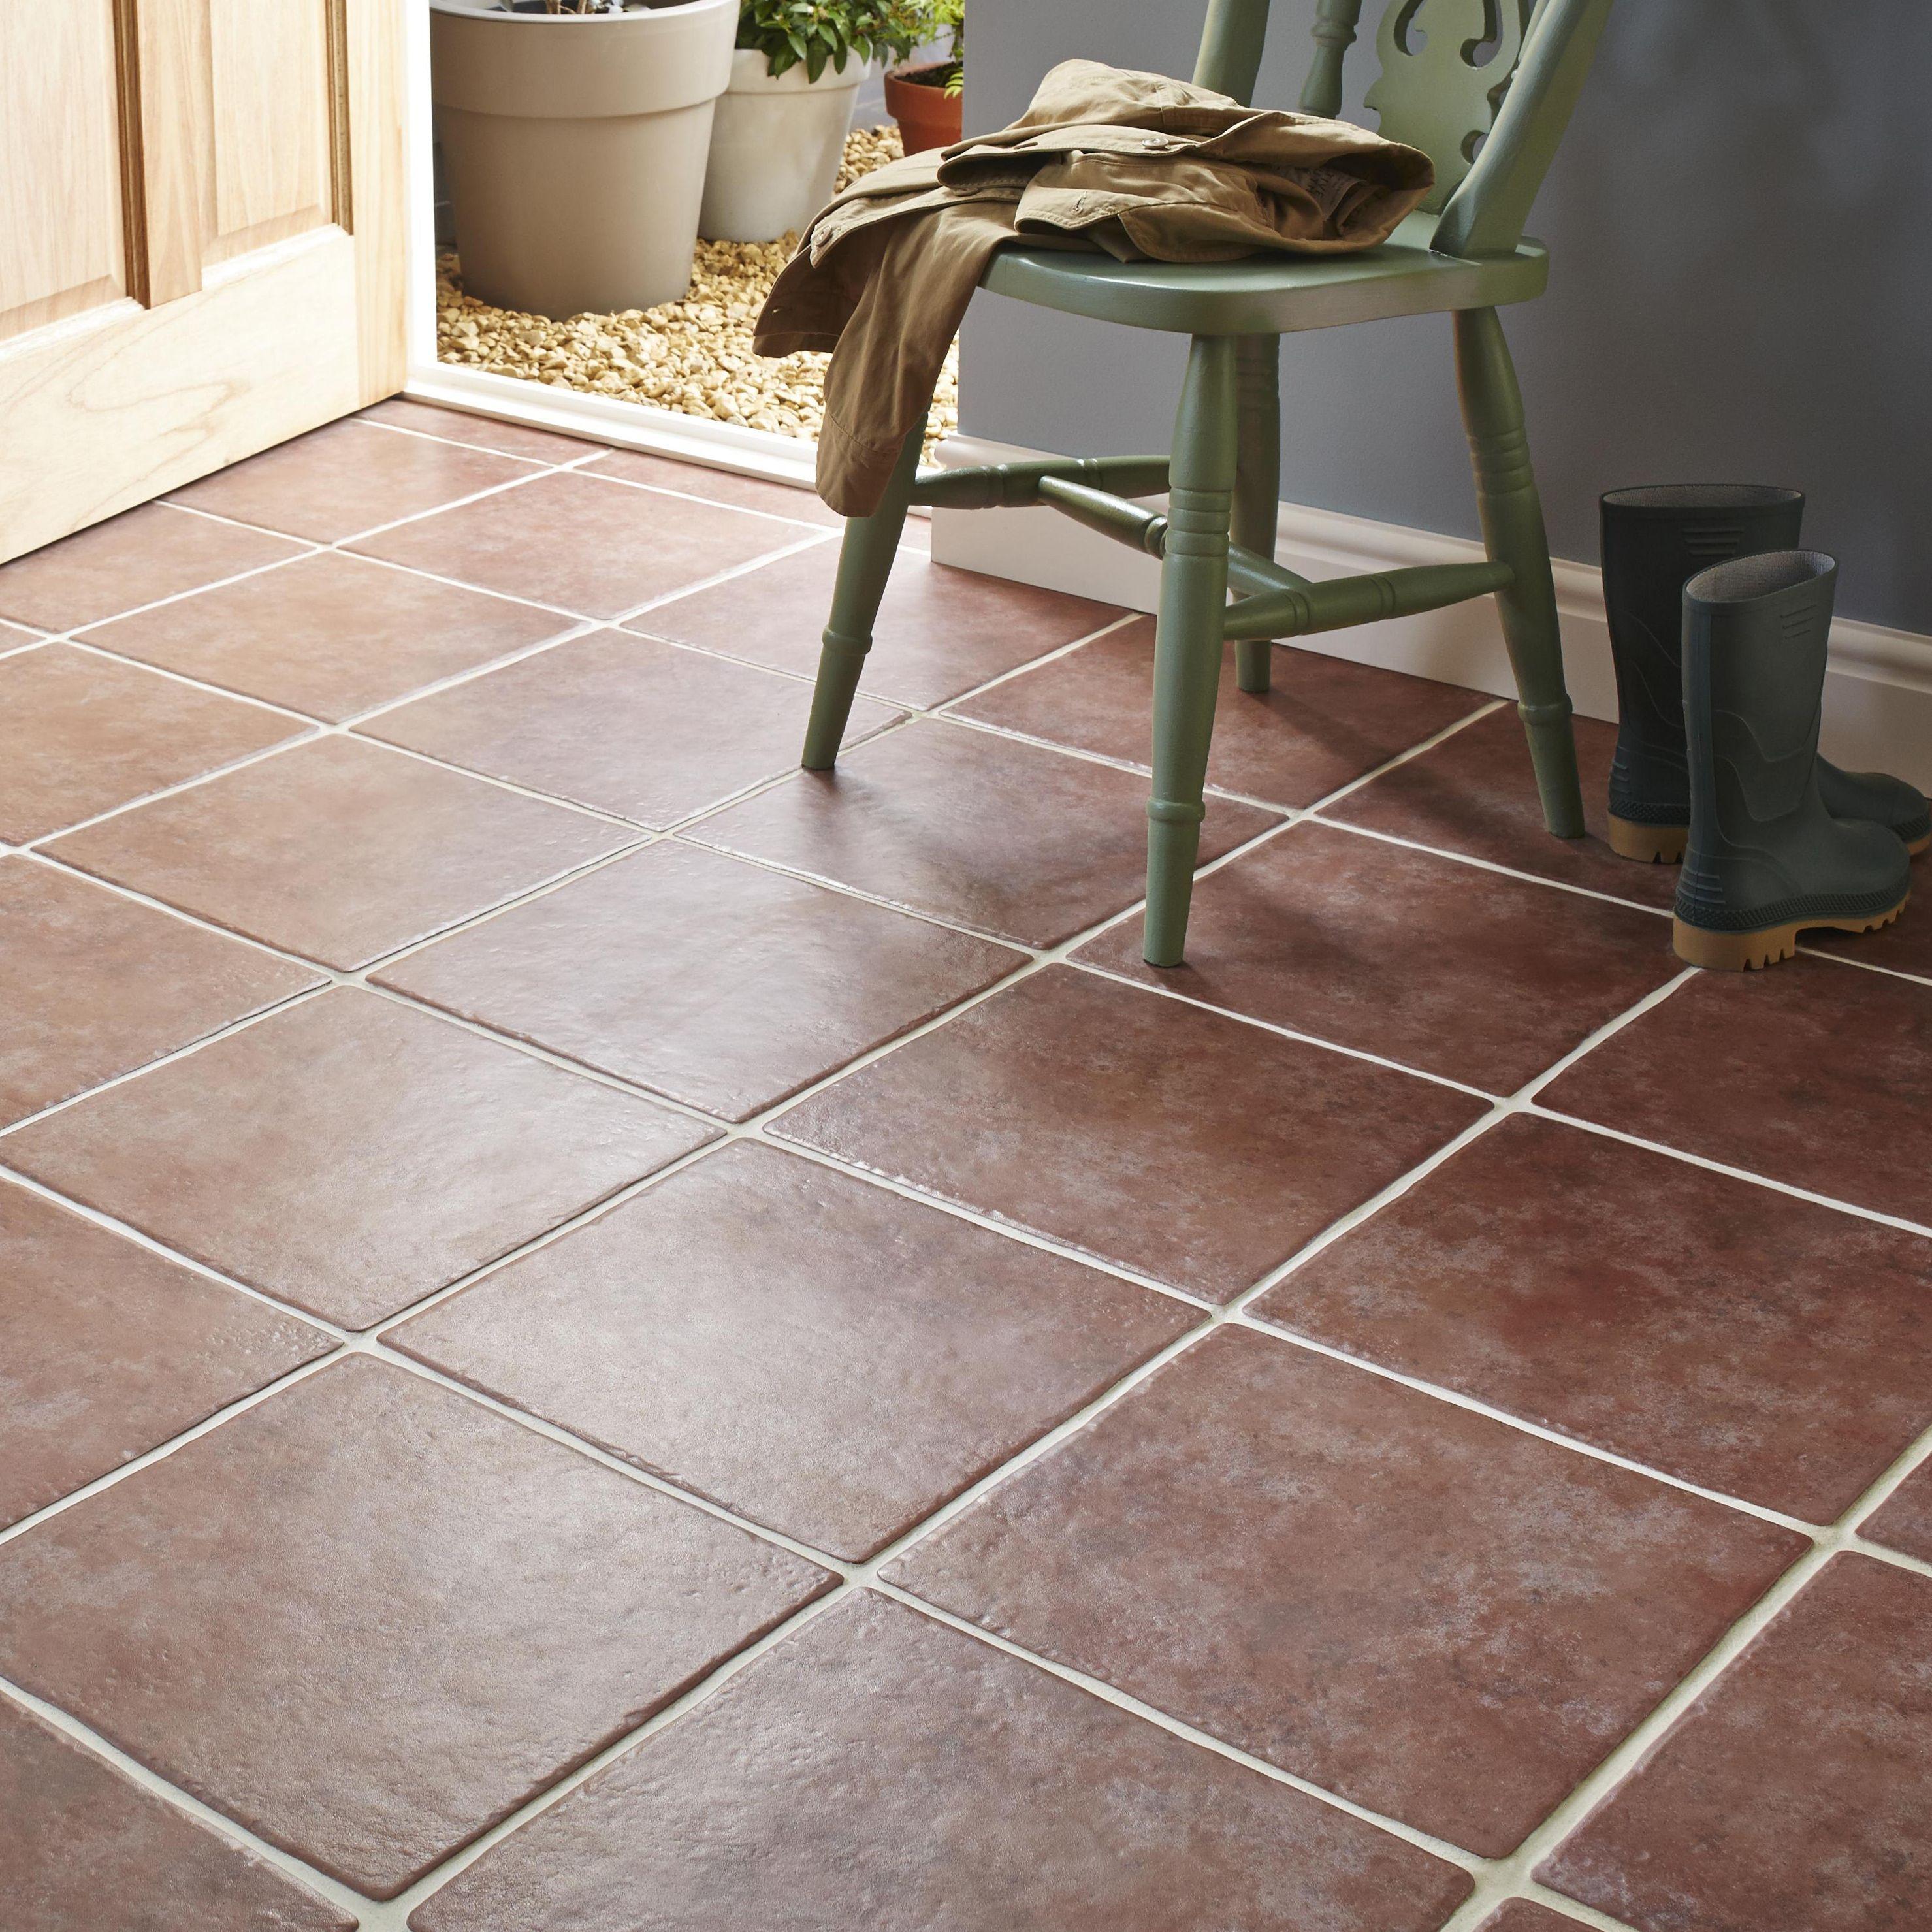 Bq Ceramic Kitchen Floor Tiles Calcuta Red Ceramic Floor Tile Pack Of 9 L330mm W330mm Diy